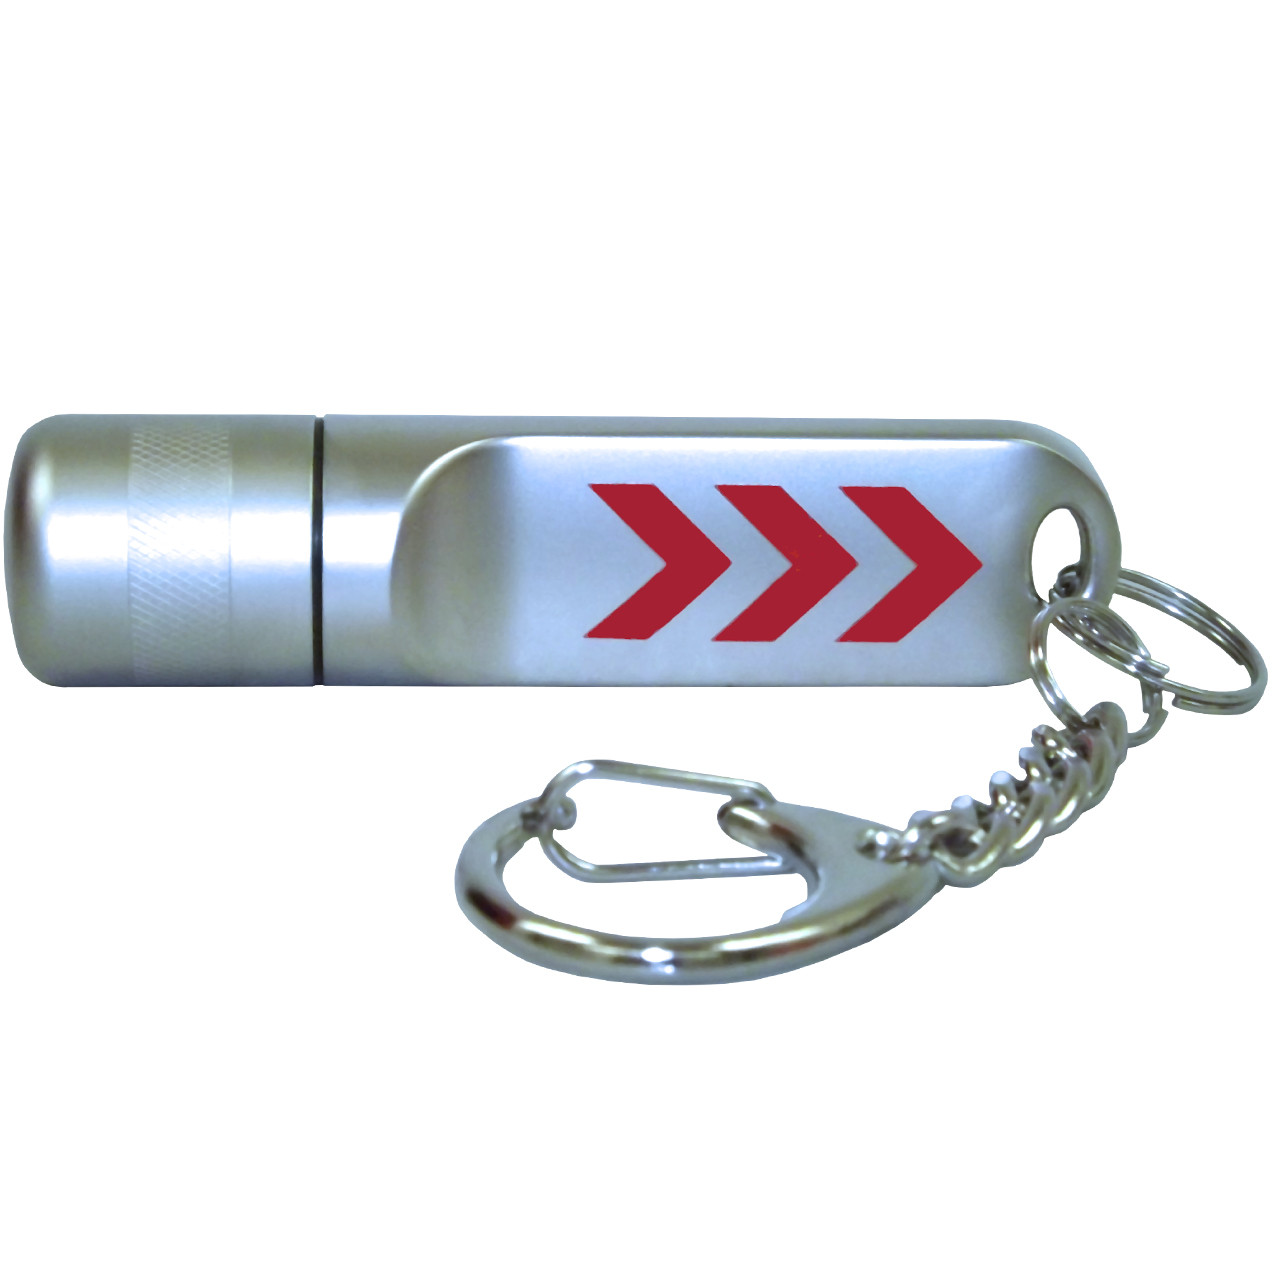 Waterproof USB Memory Stick with FREE FEMA Document Library (16GB)